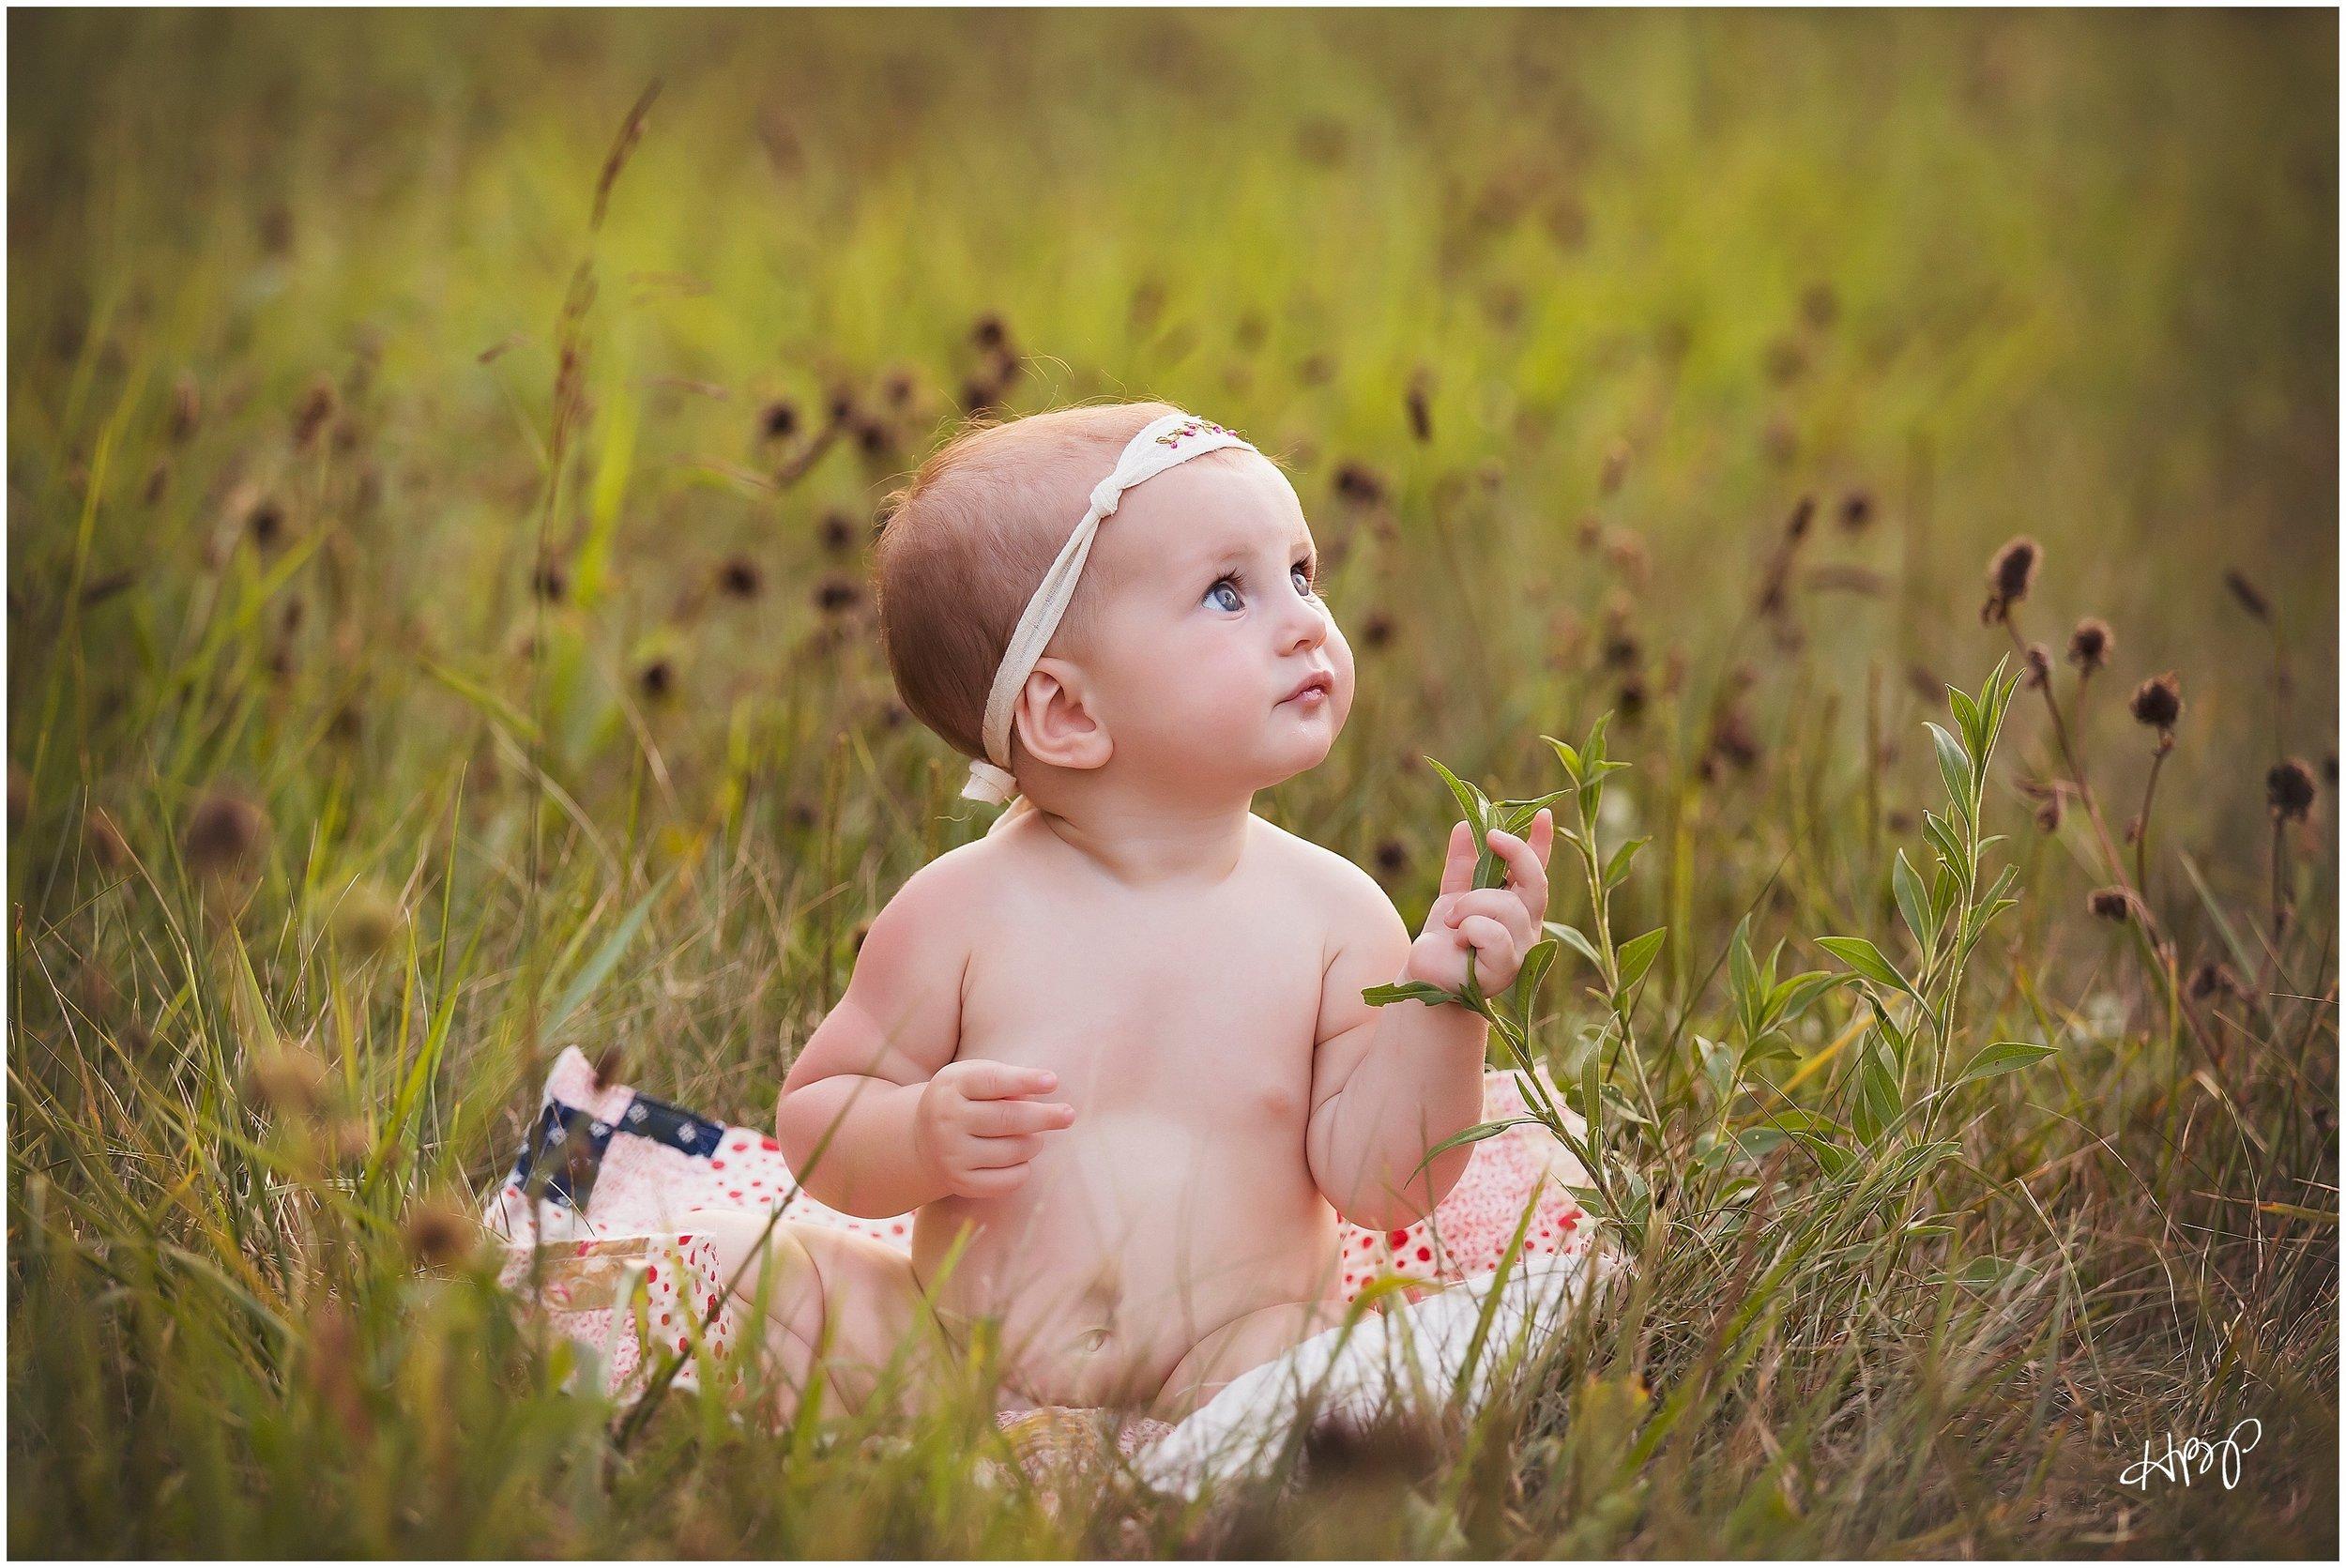 HBP Child Photography Crofton, MD ©Hope Believe Photography.jpg